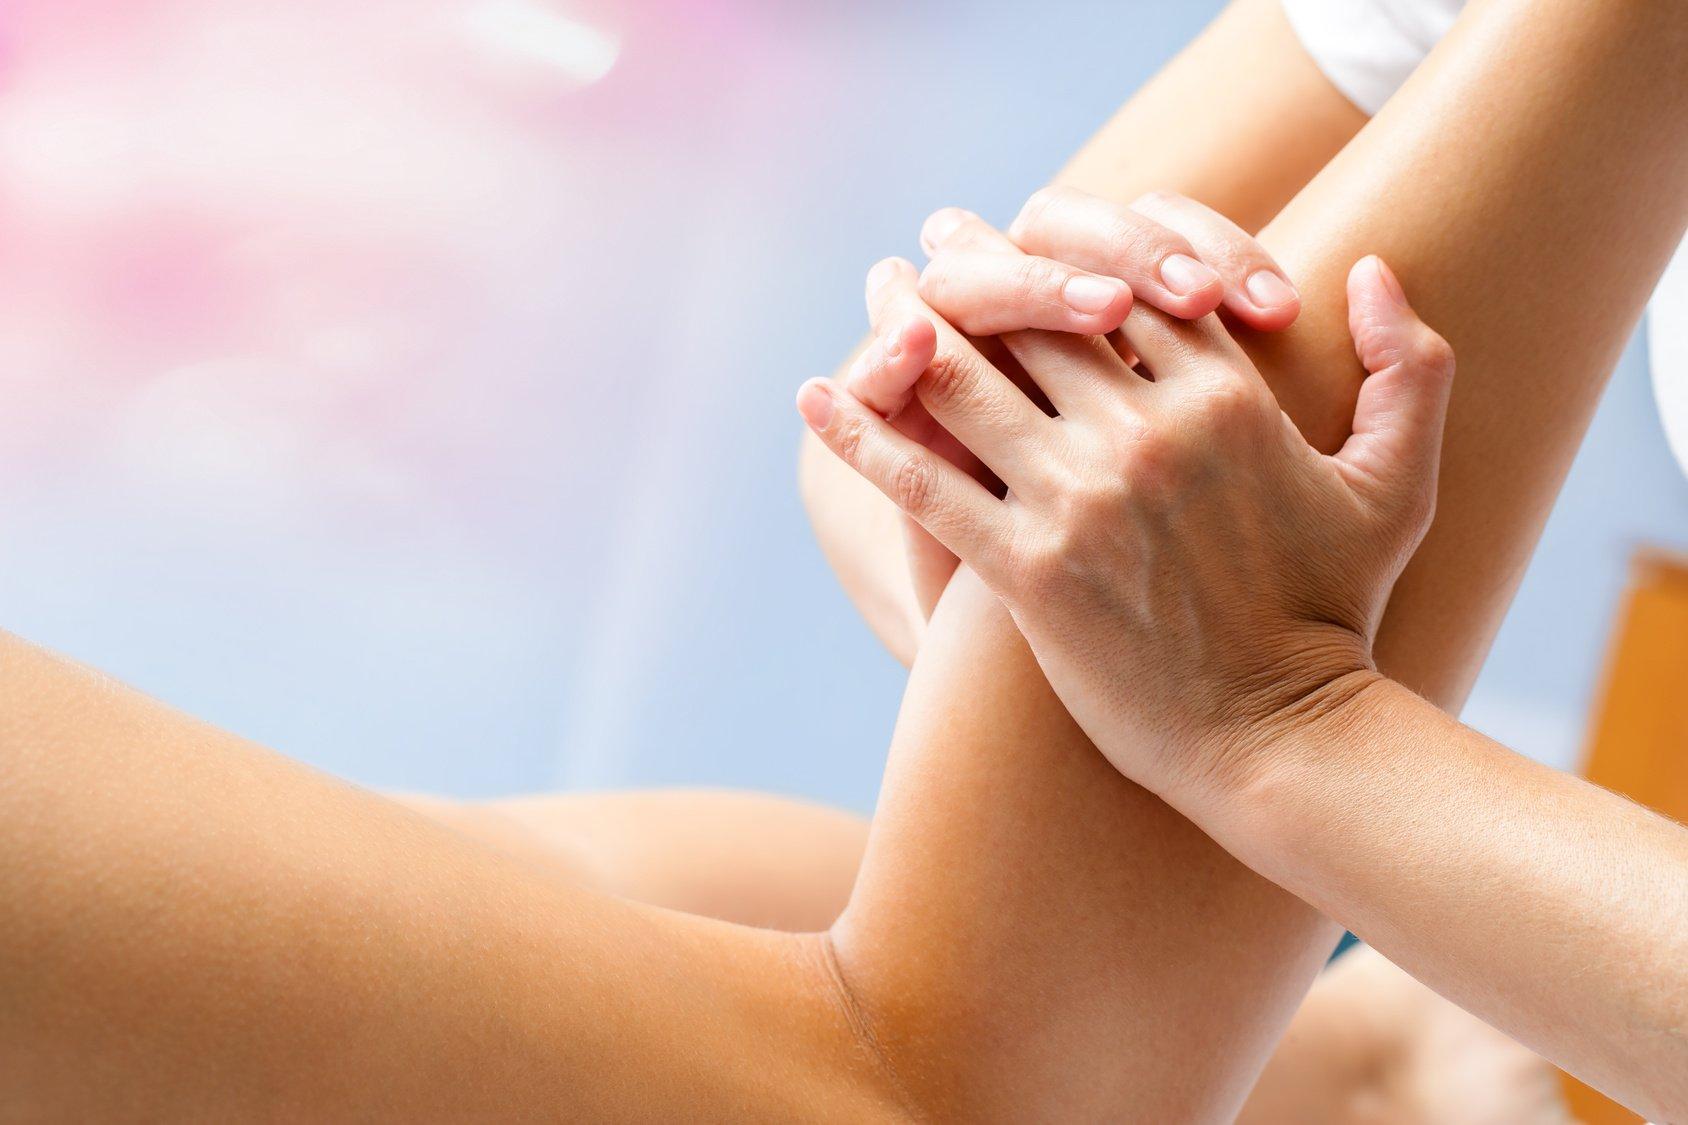 Macro close up of osteopath massaging female calf muscle. Hands manipulating lower leg muscle.